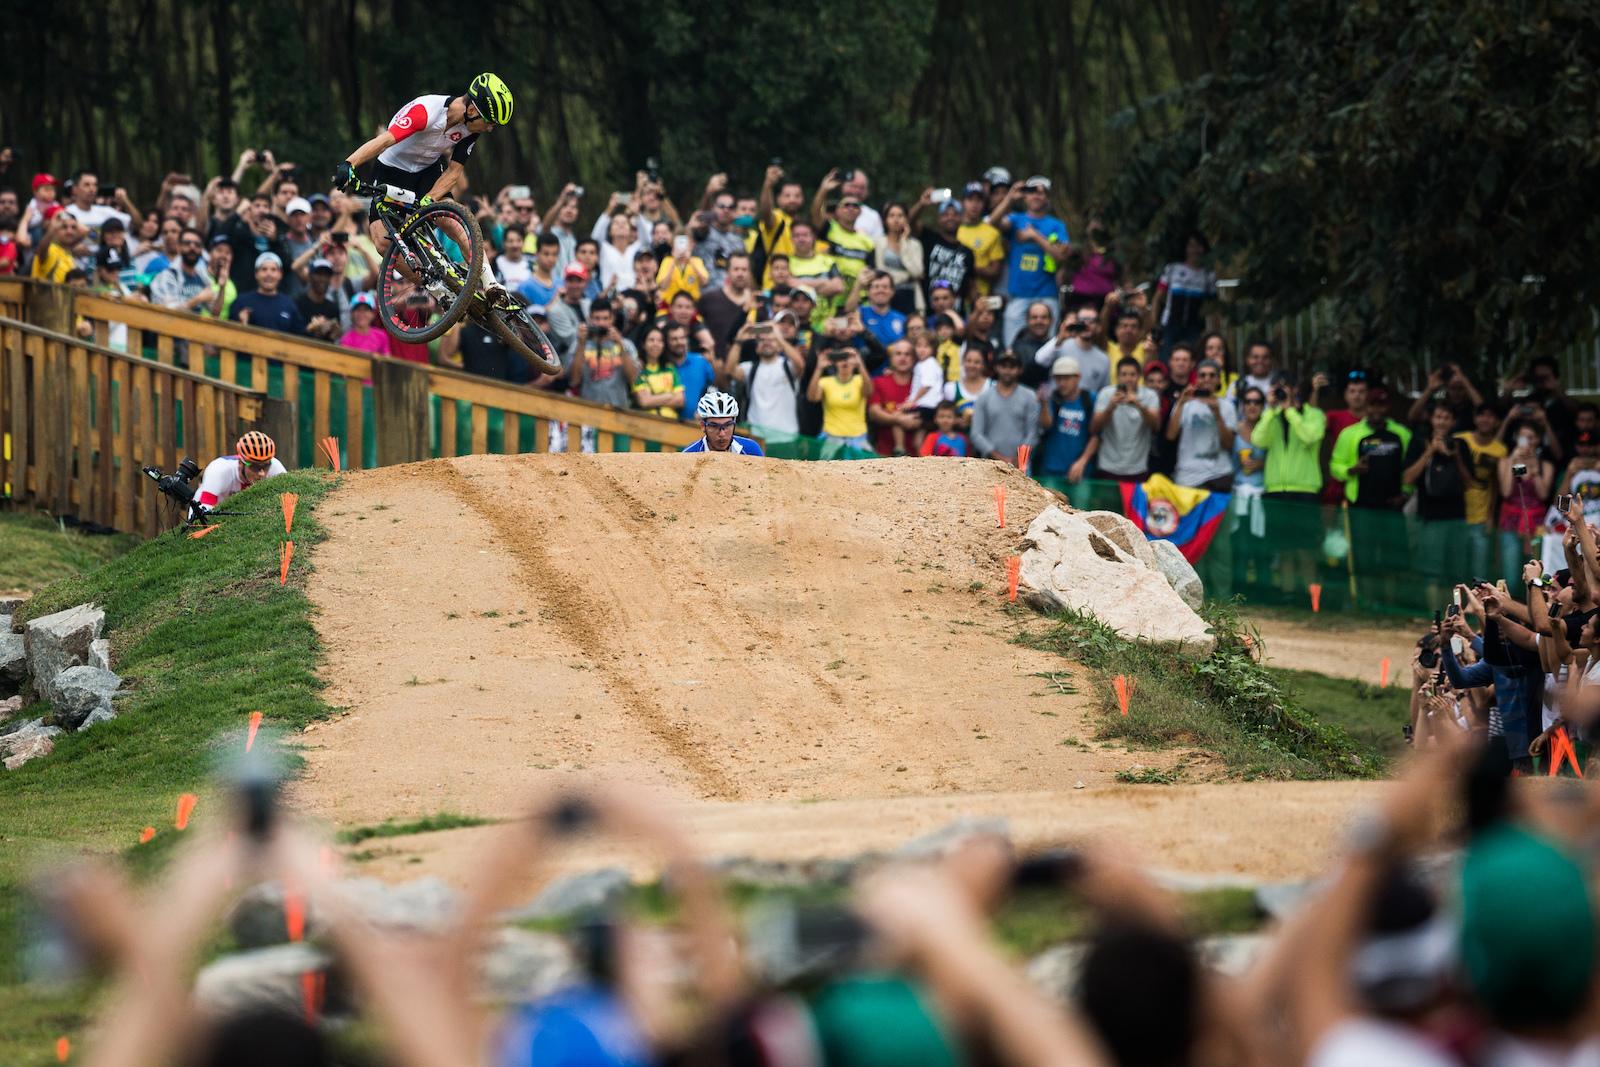 Nino Schurter wins the Olympic XC race 2016